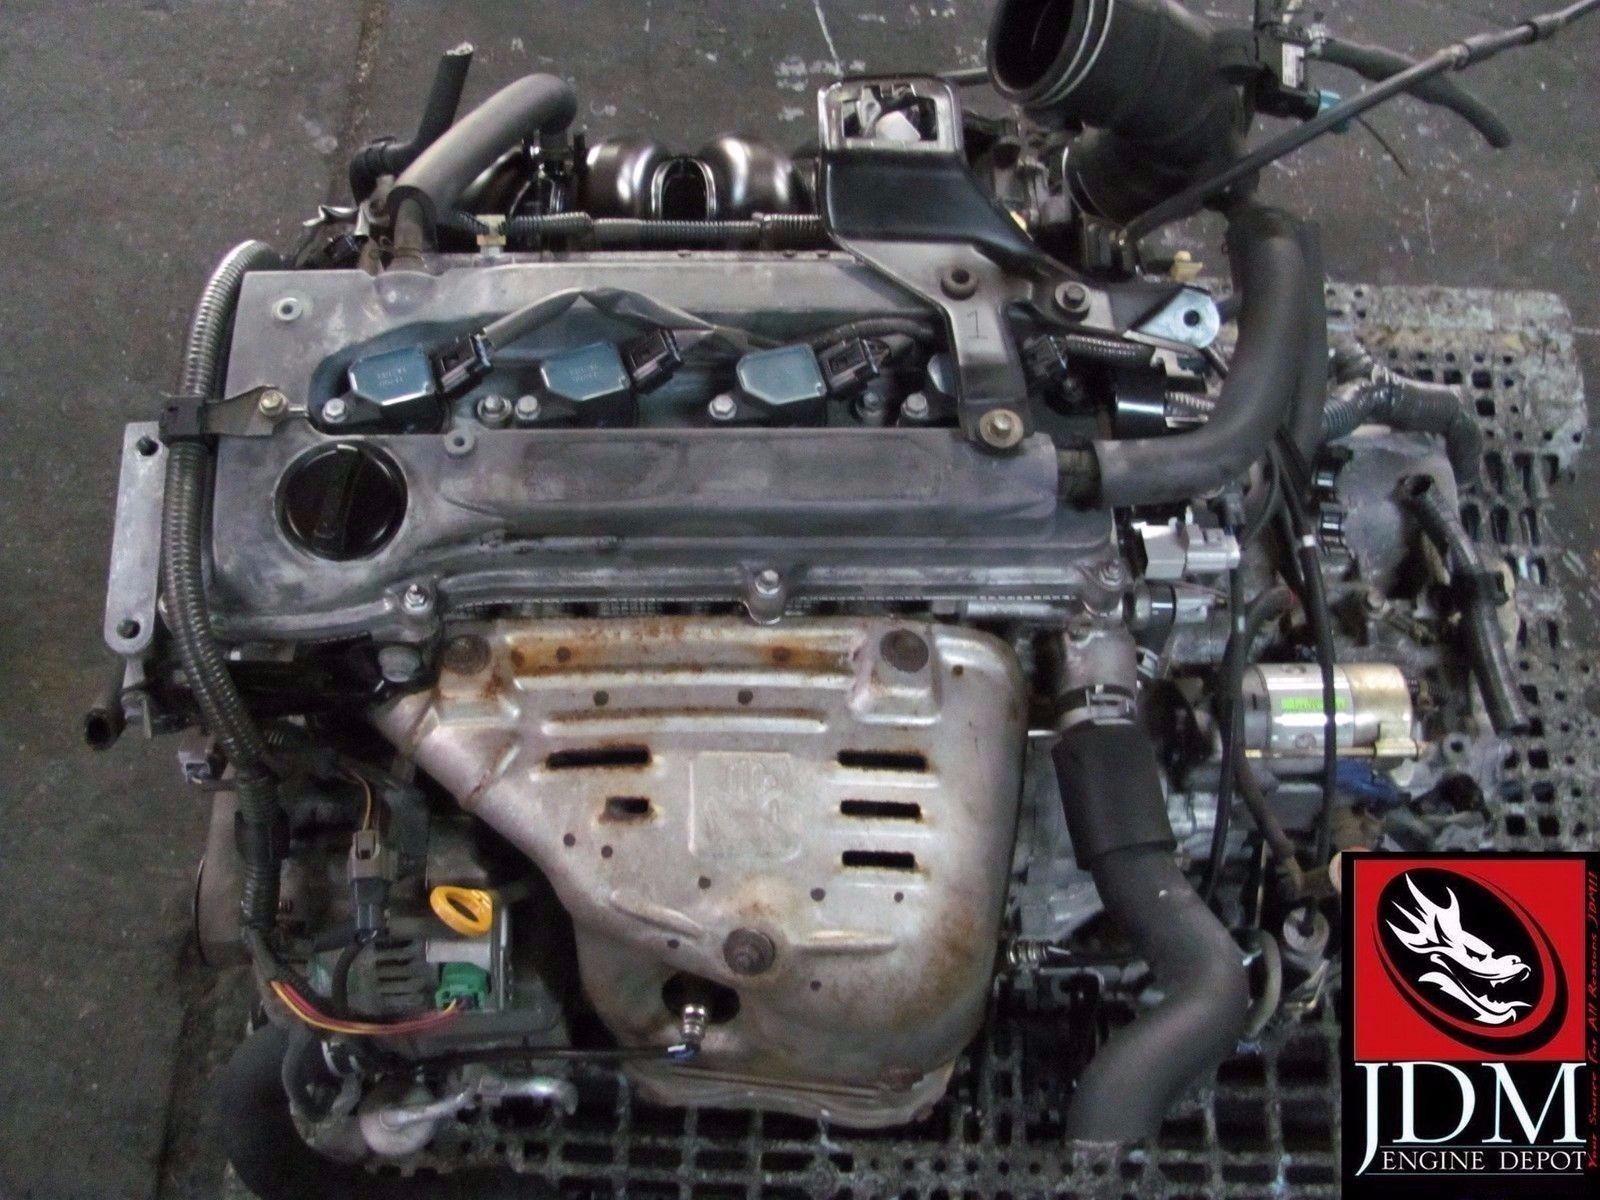 09 11 toyota matrix xr 2 4l twin cam 4 cylinder engine jdm 2az fe 2az ebay